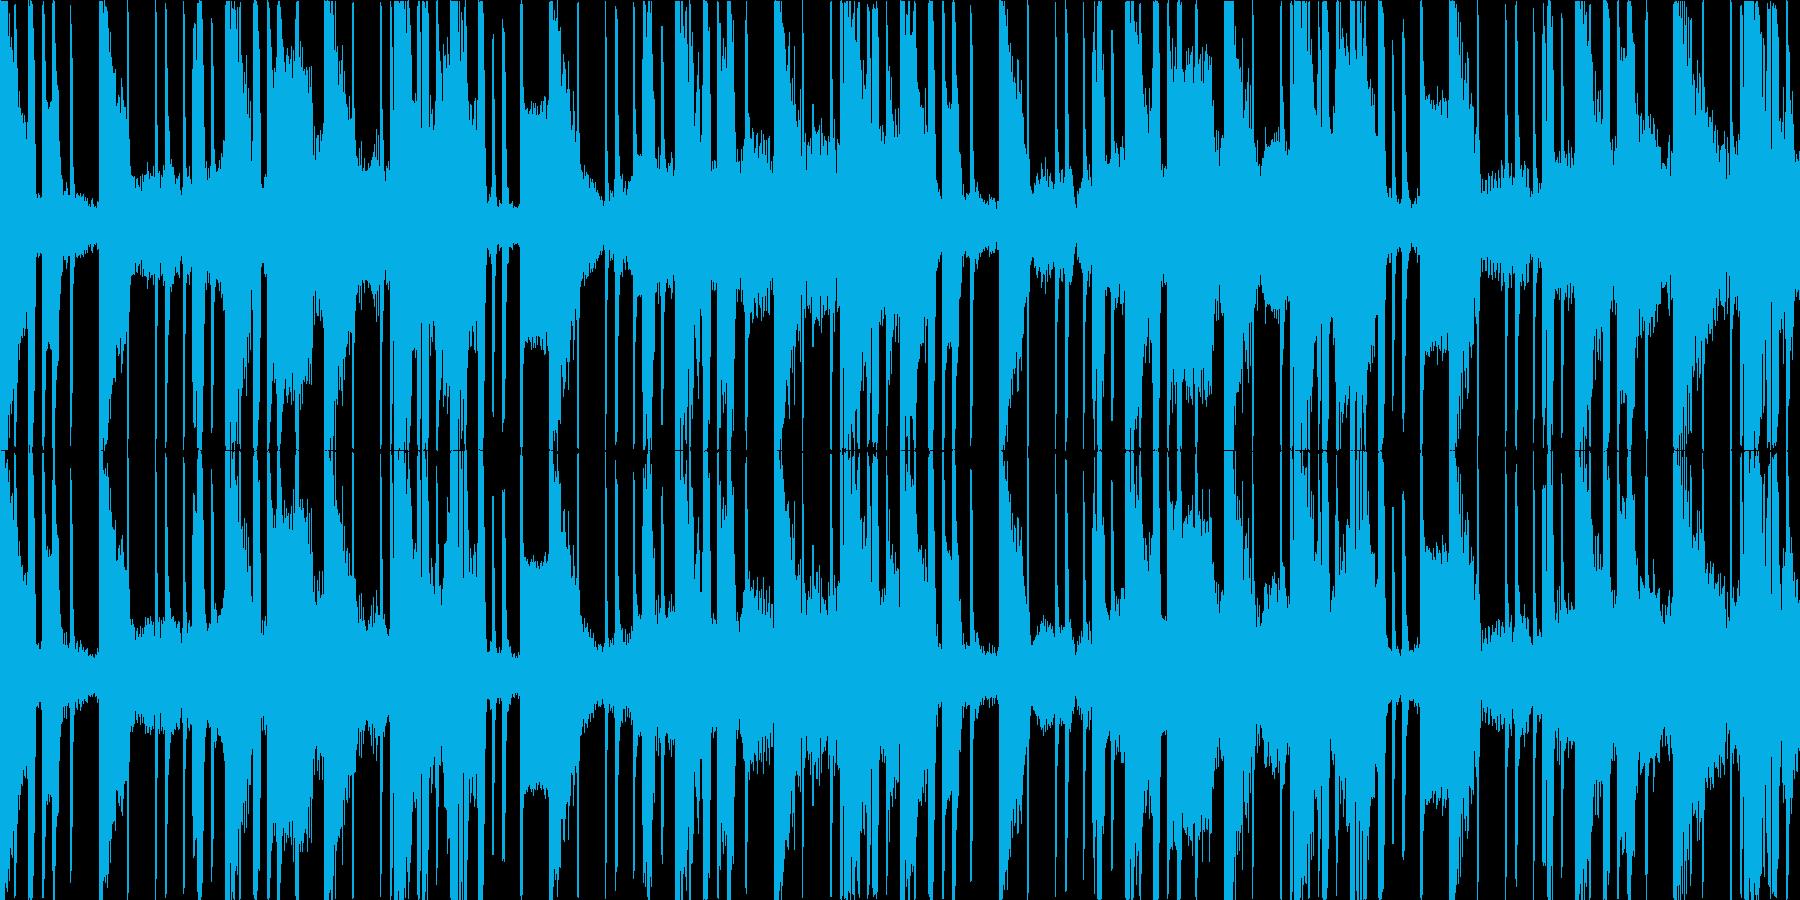 2step風の簡素なループ。低域強め。の再生済みの波形